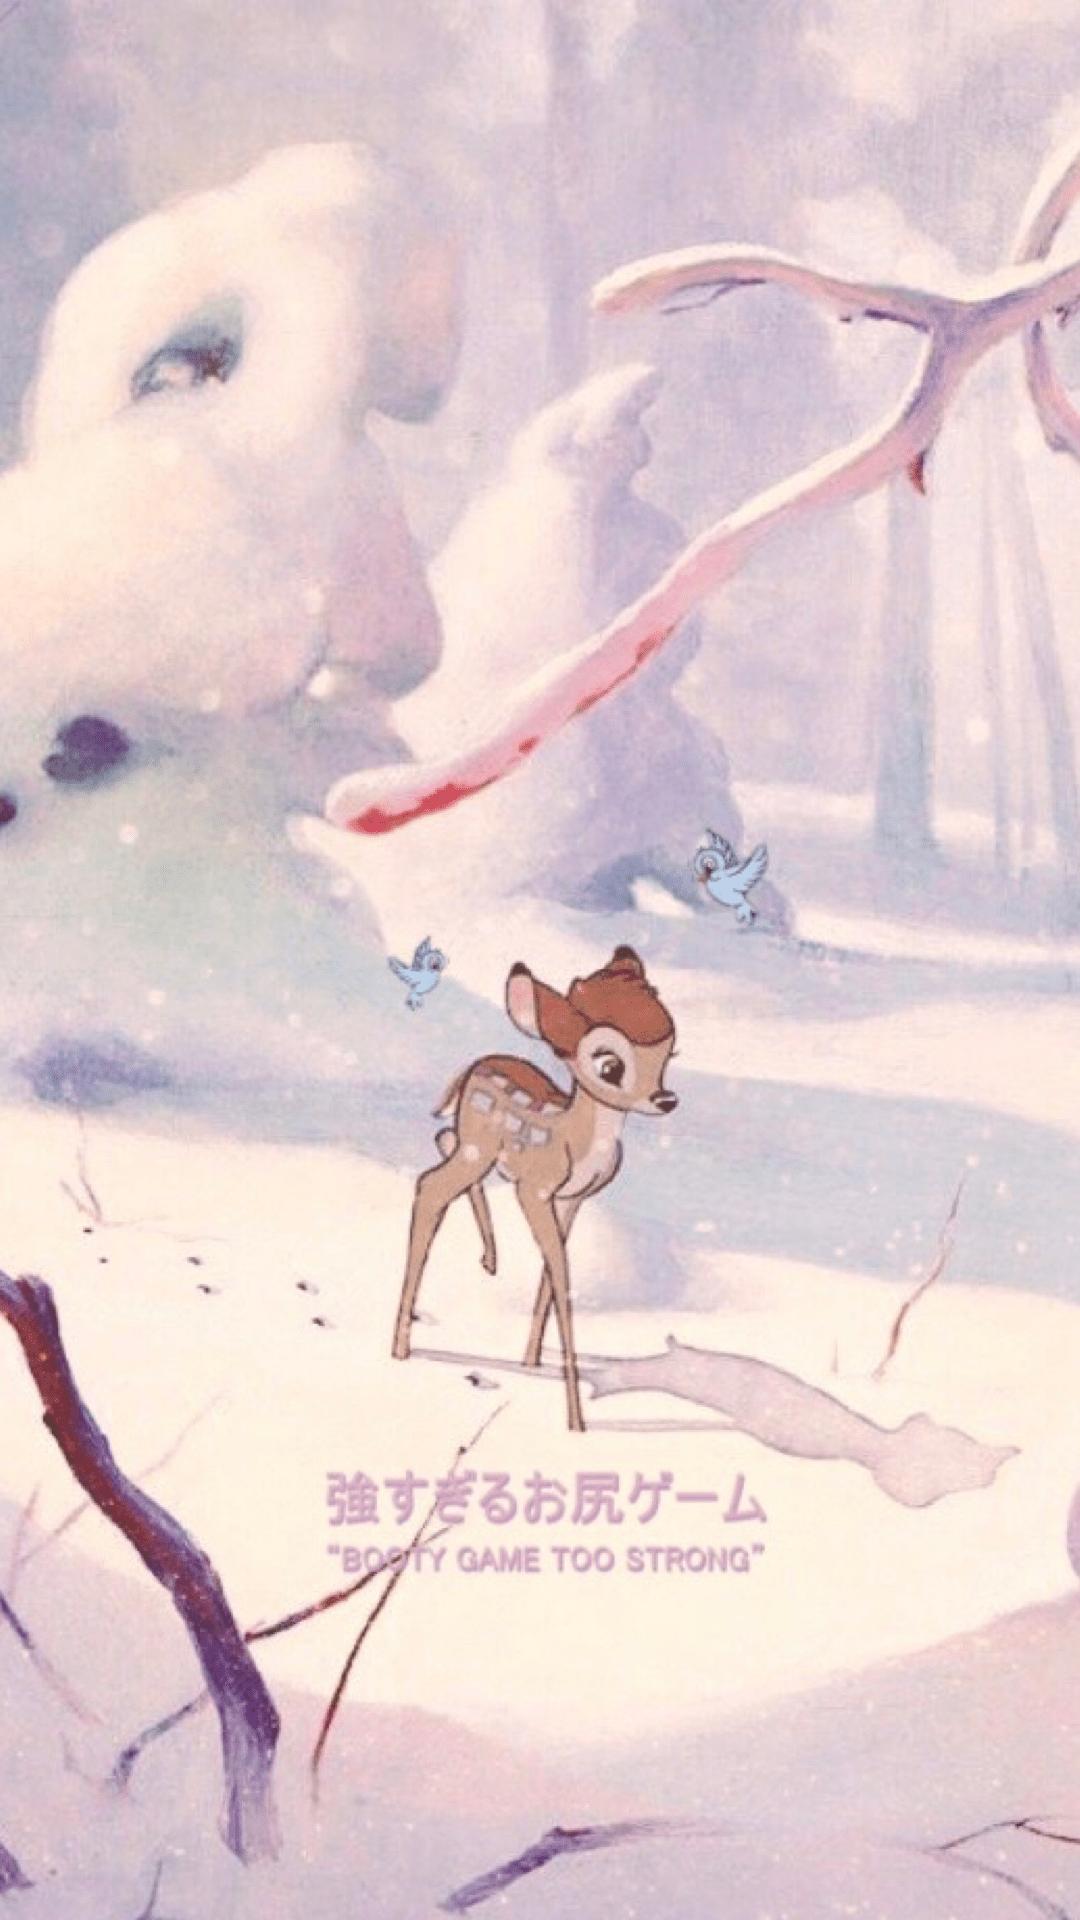 Bambi Iphone Wallpapers Top Free Bambi Iphone Backgrounds Wallpaperaccess